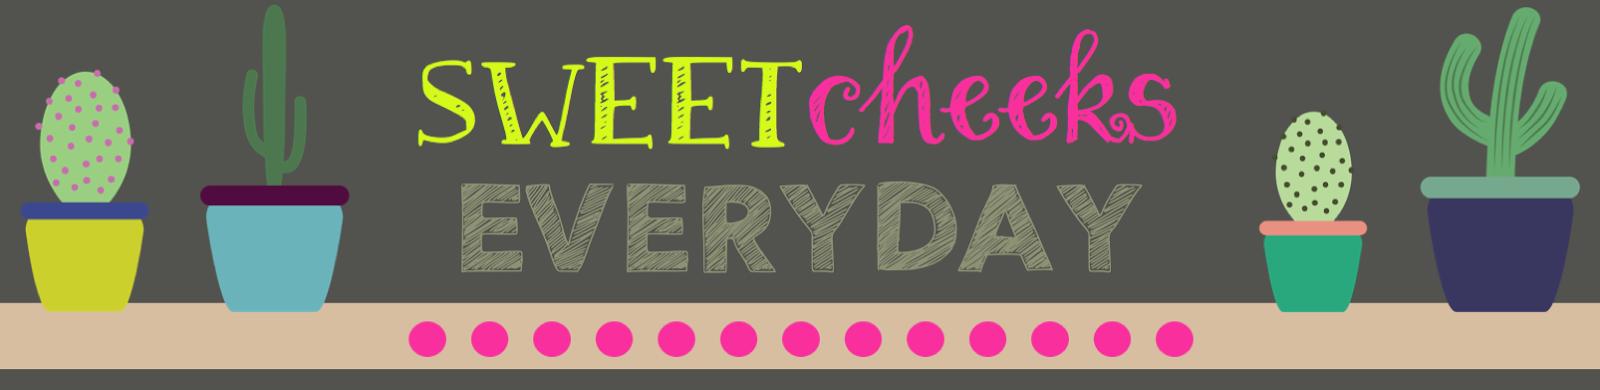 Sweet Cheeks Everyday